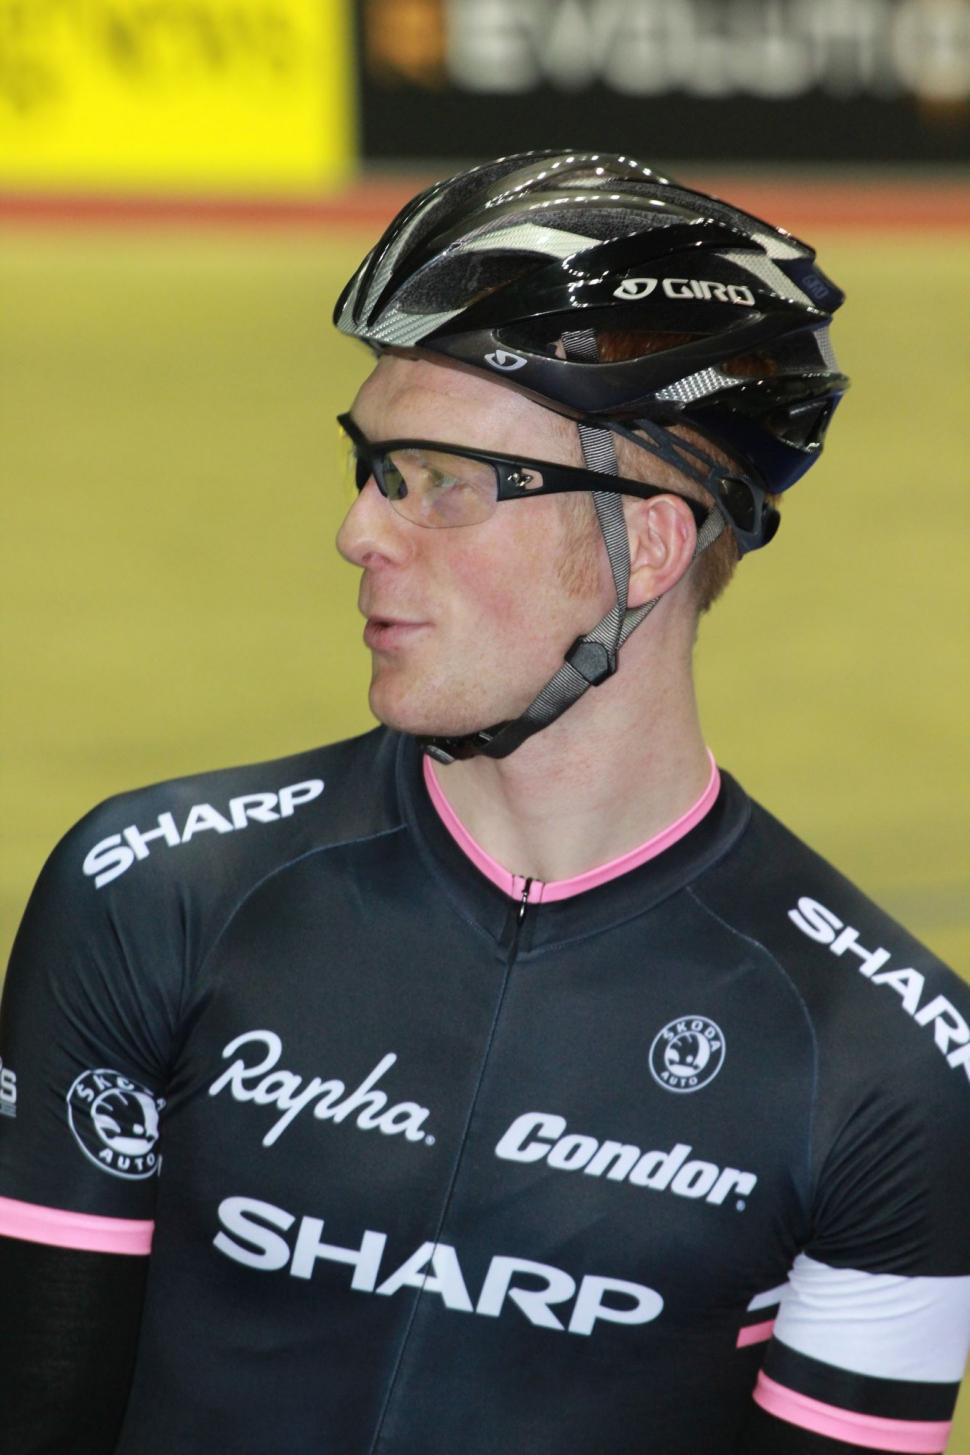 Ed Clancy – in Team Rapha Condor Sharp kit